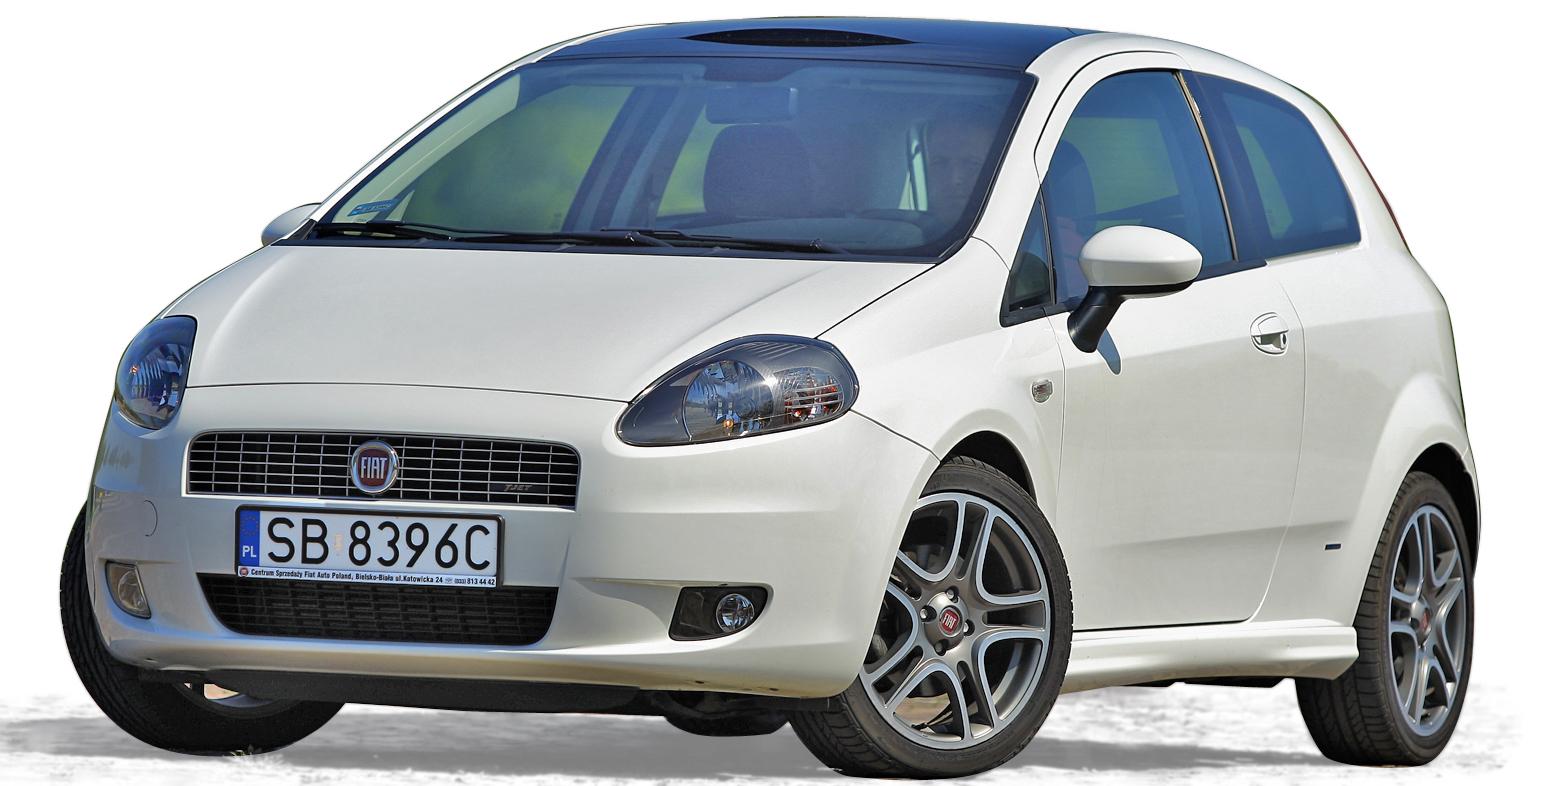 Fiat Grande Punto (2005-2009)